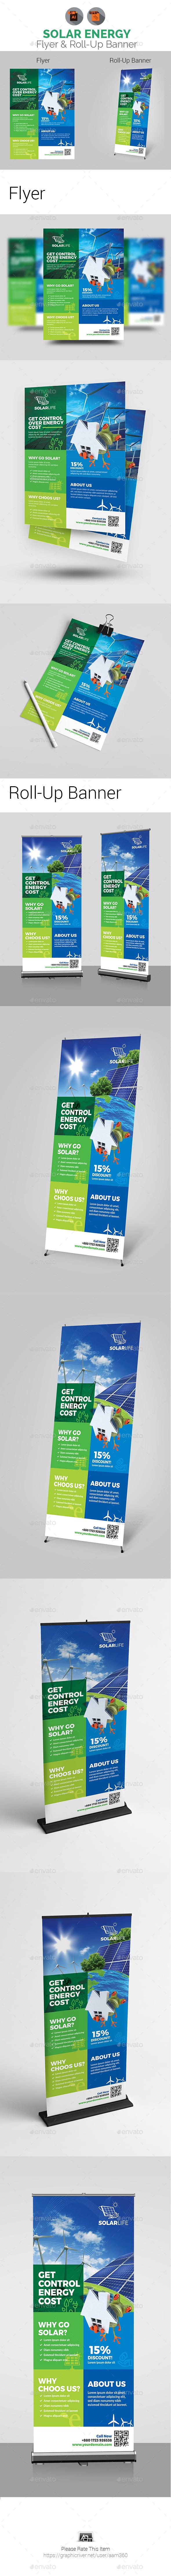 Solar Energy Flyer & Rollup Banner Bundle - Print Templates